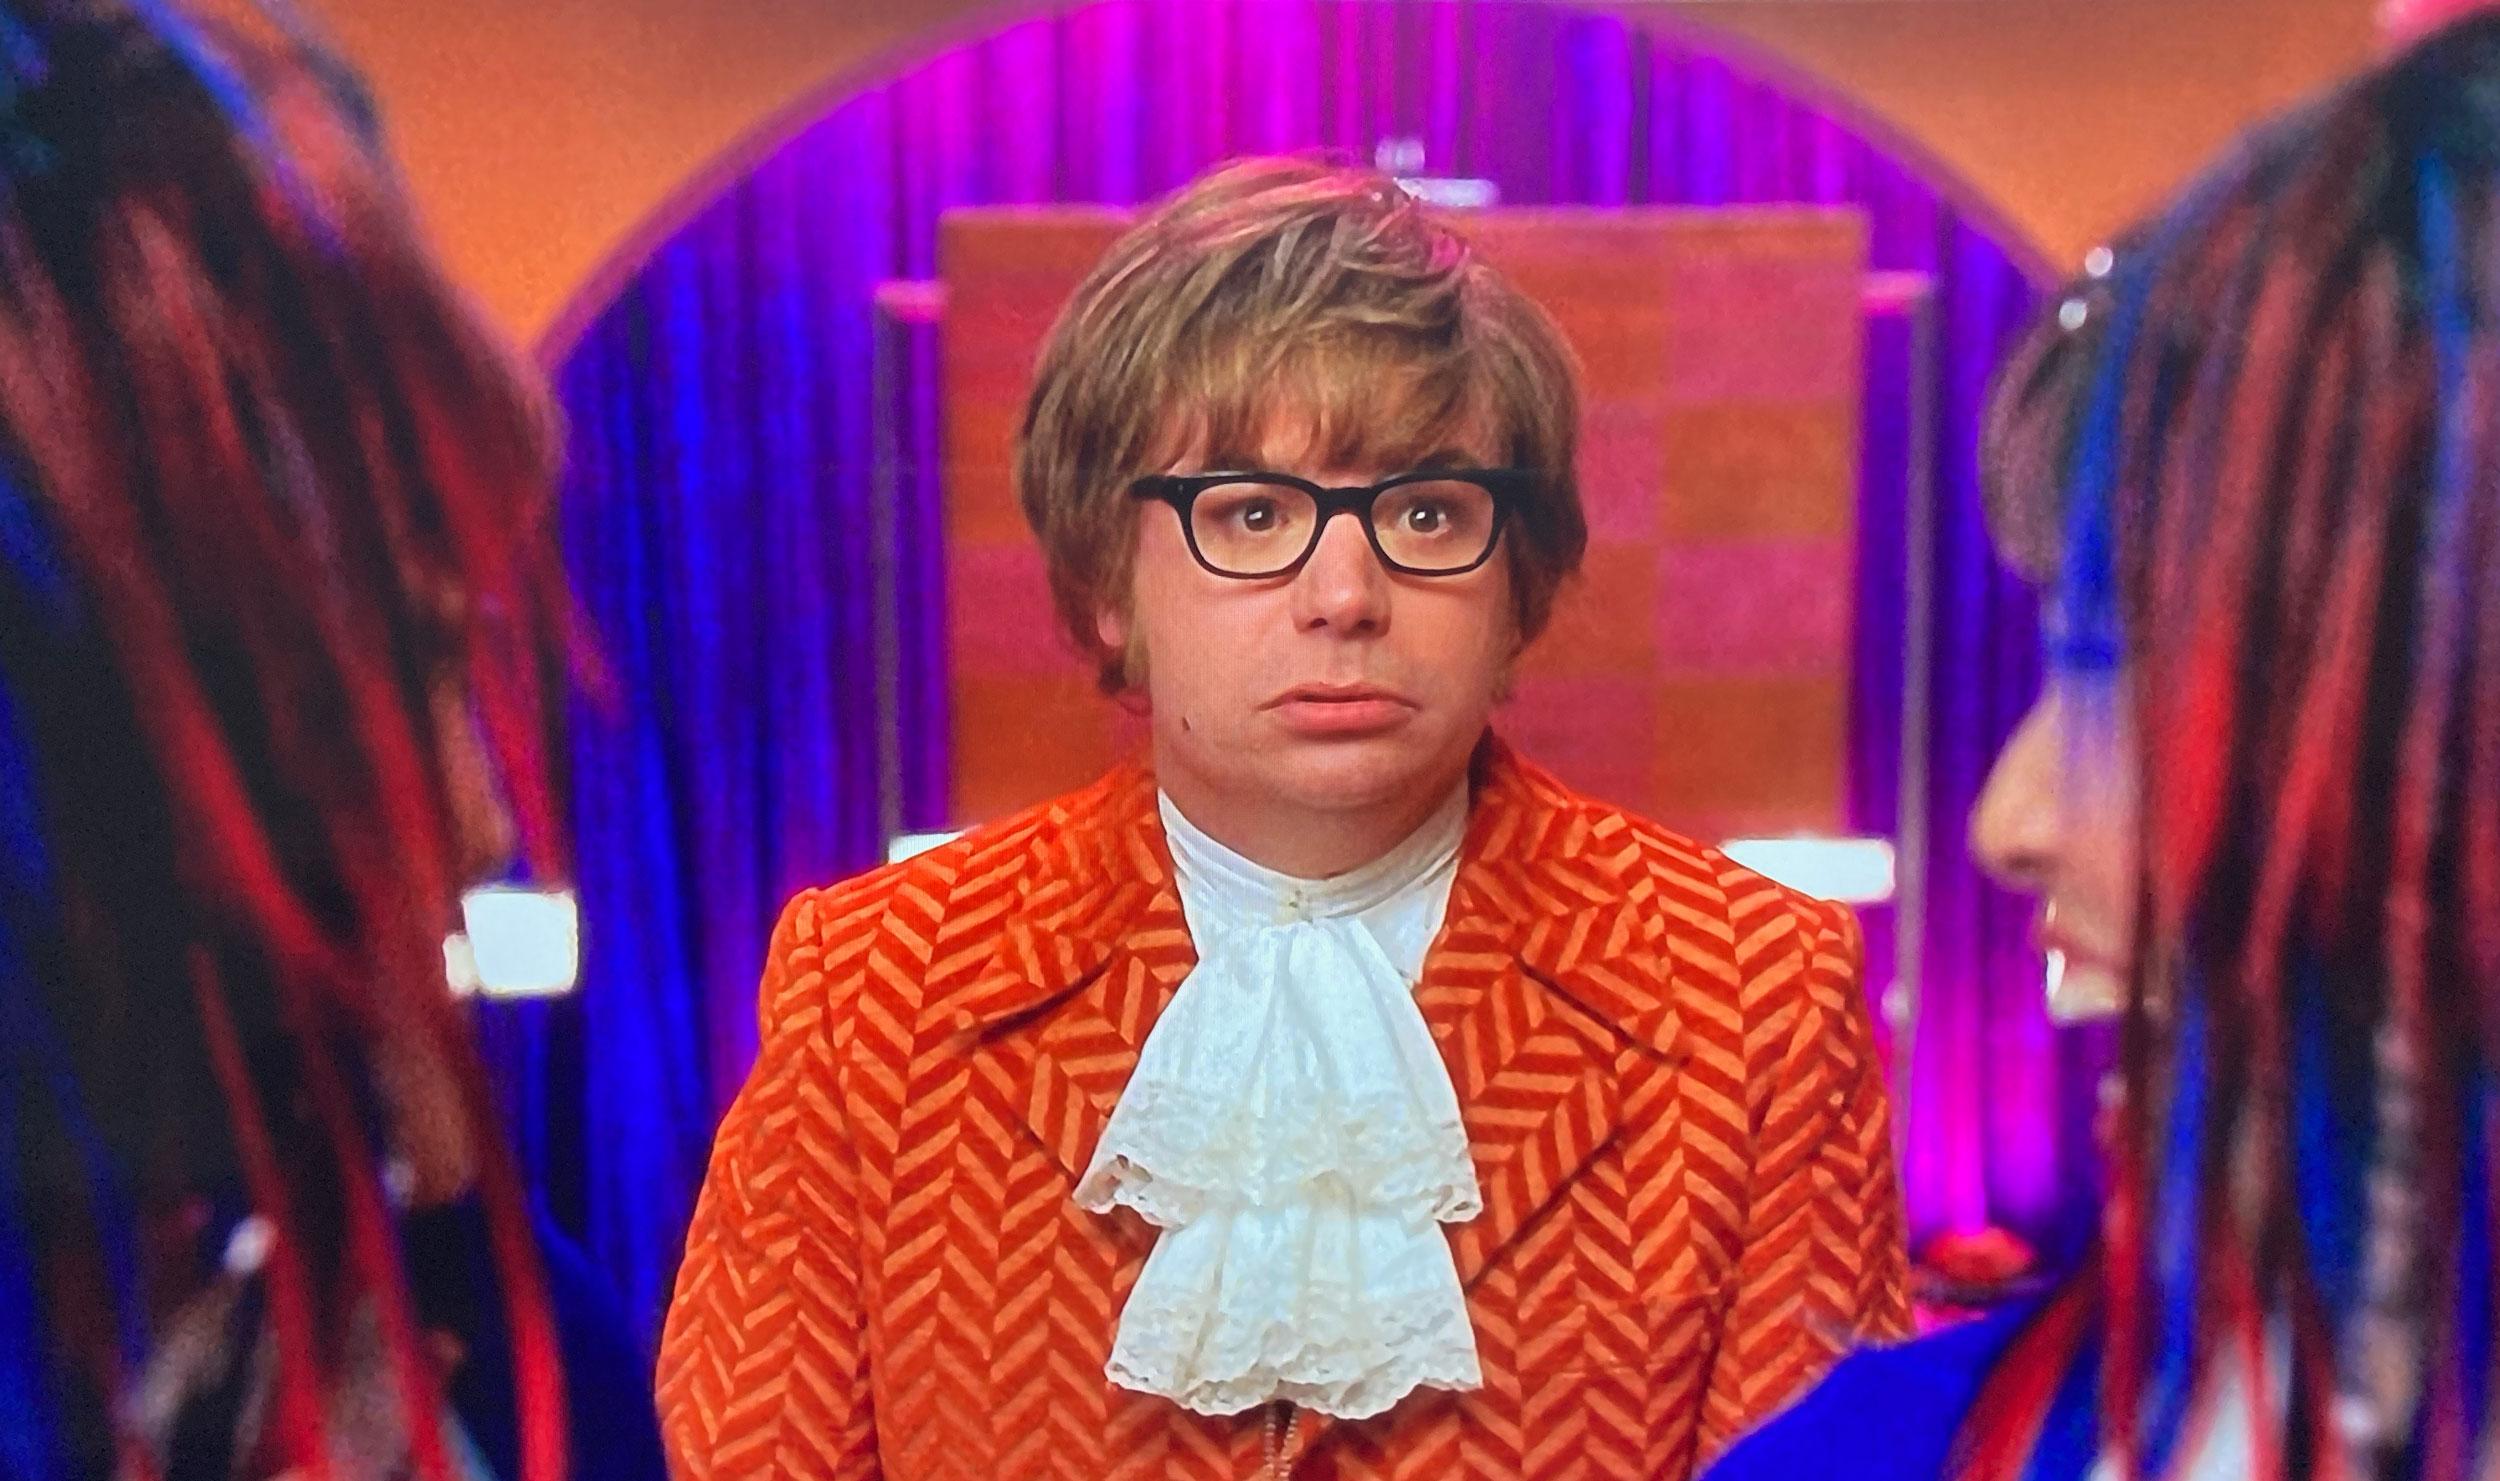 Austin Powers orange herringbone